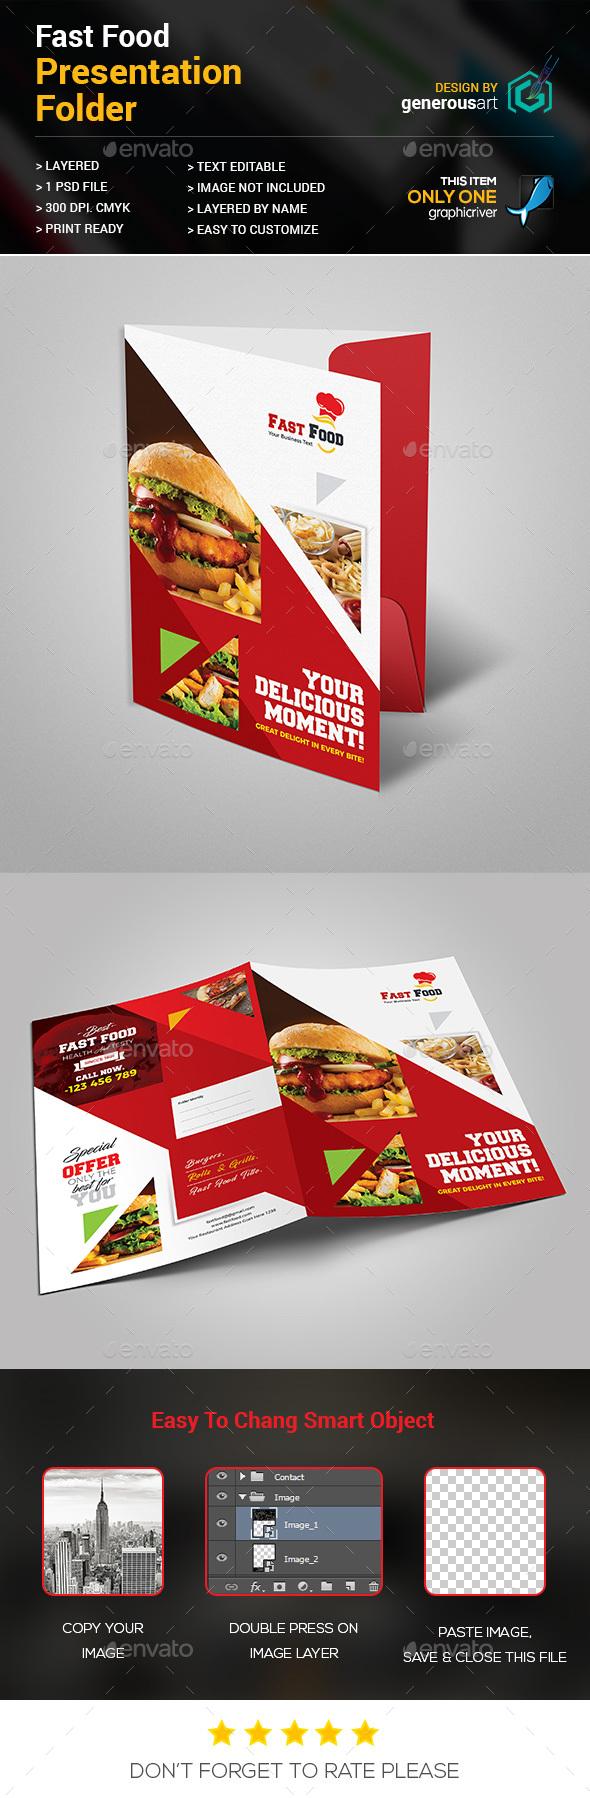 Fast Food Presentation Folder - Stationery Print Templates